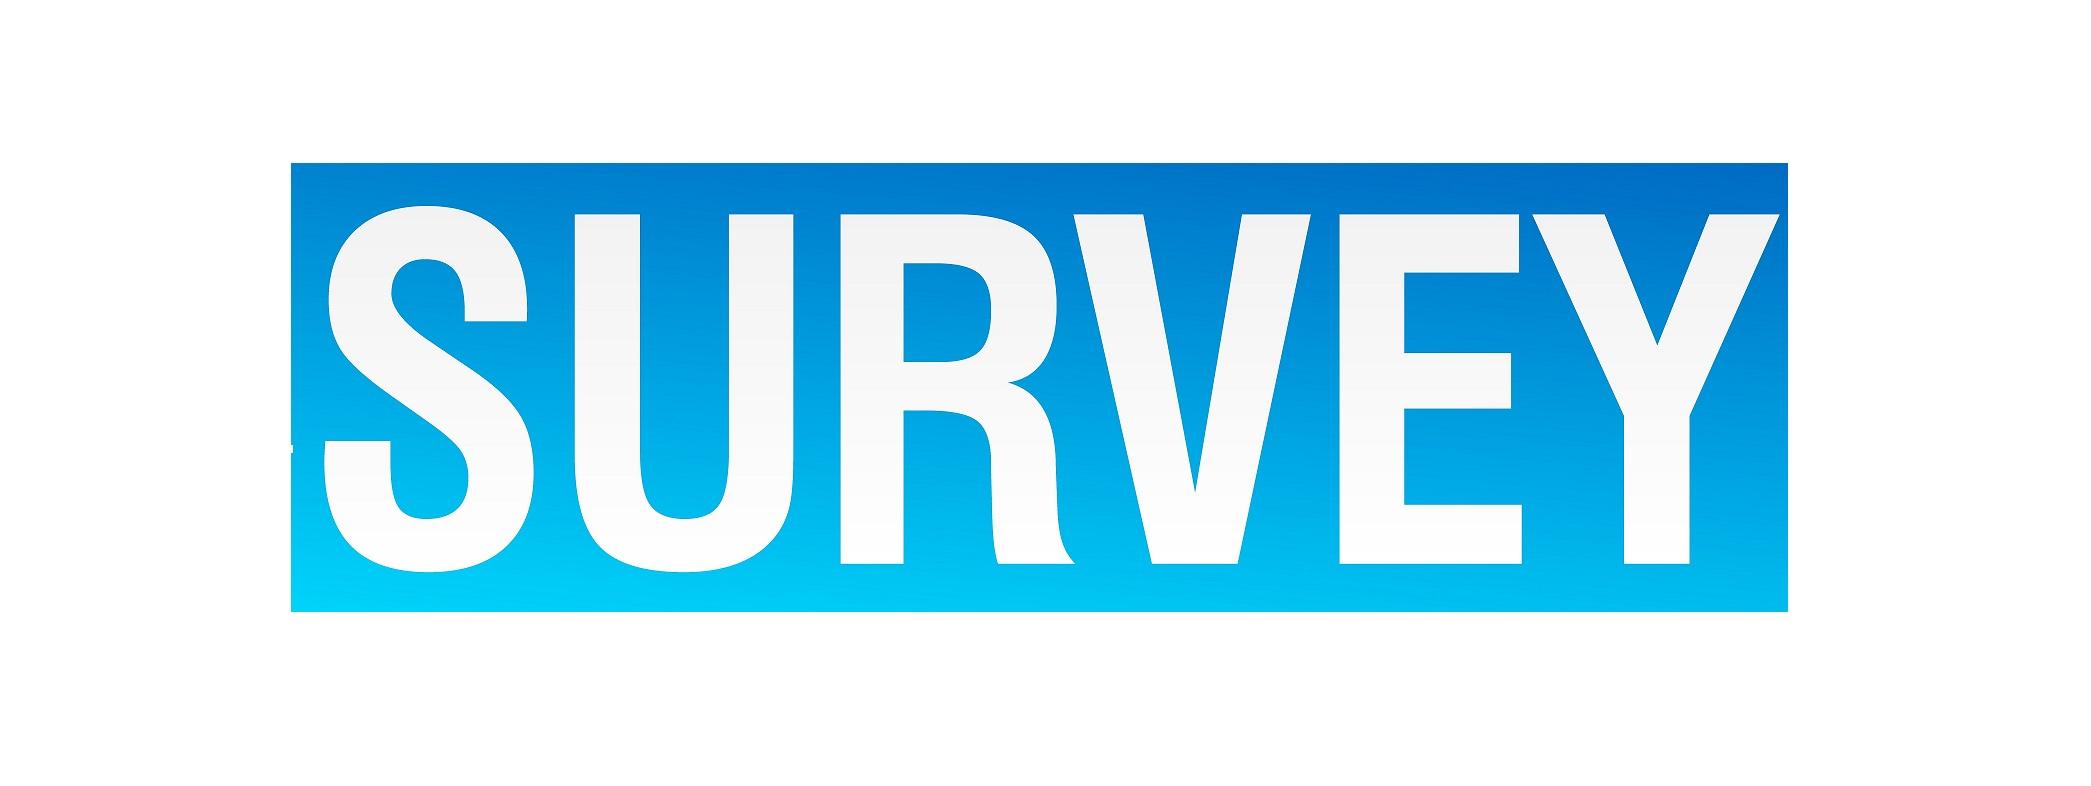 Blue text Survey